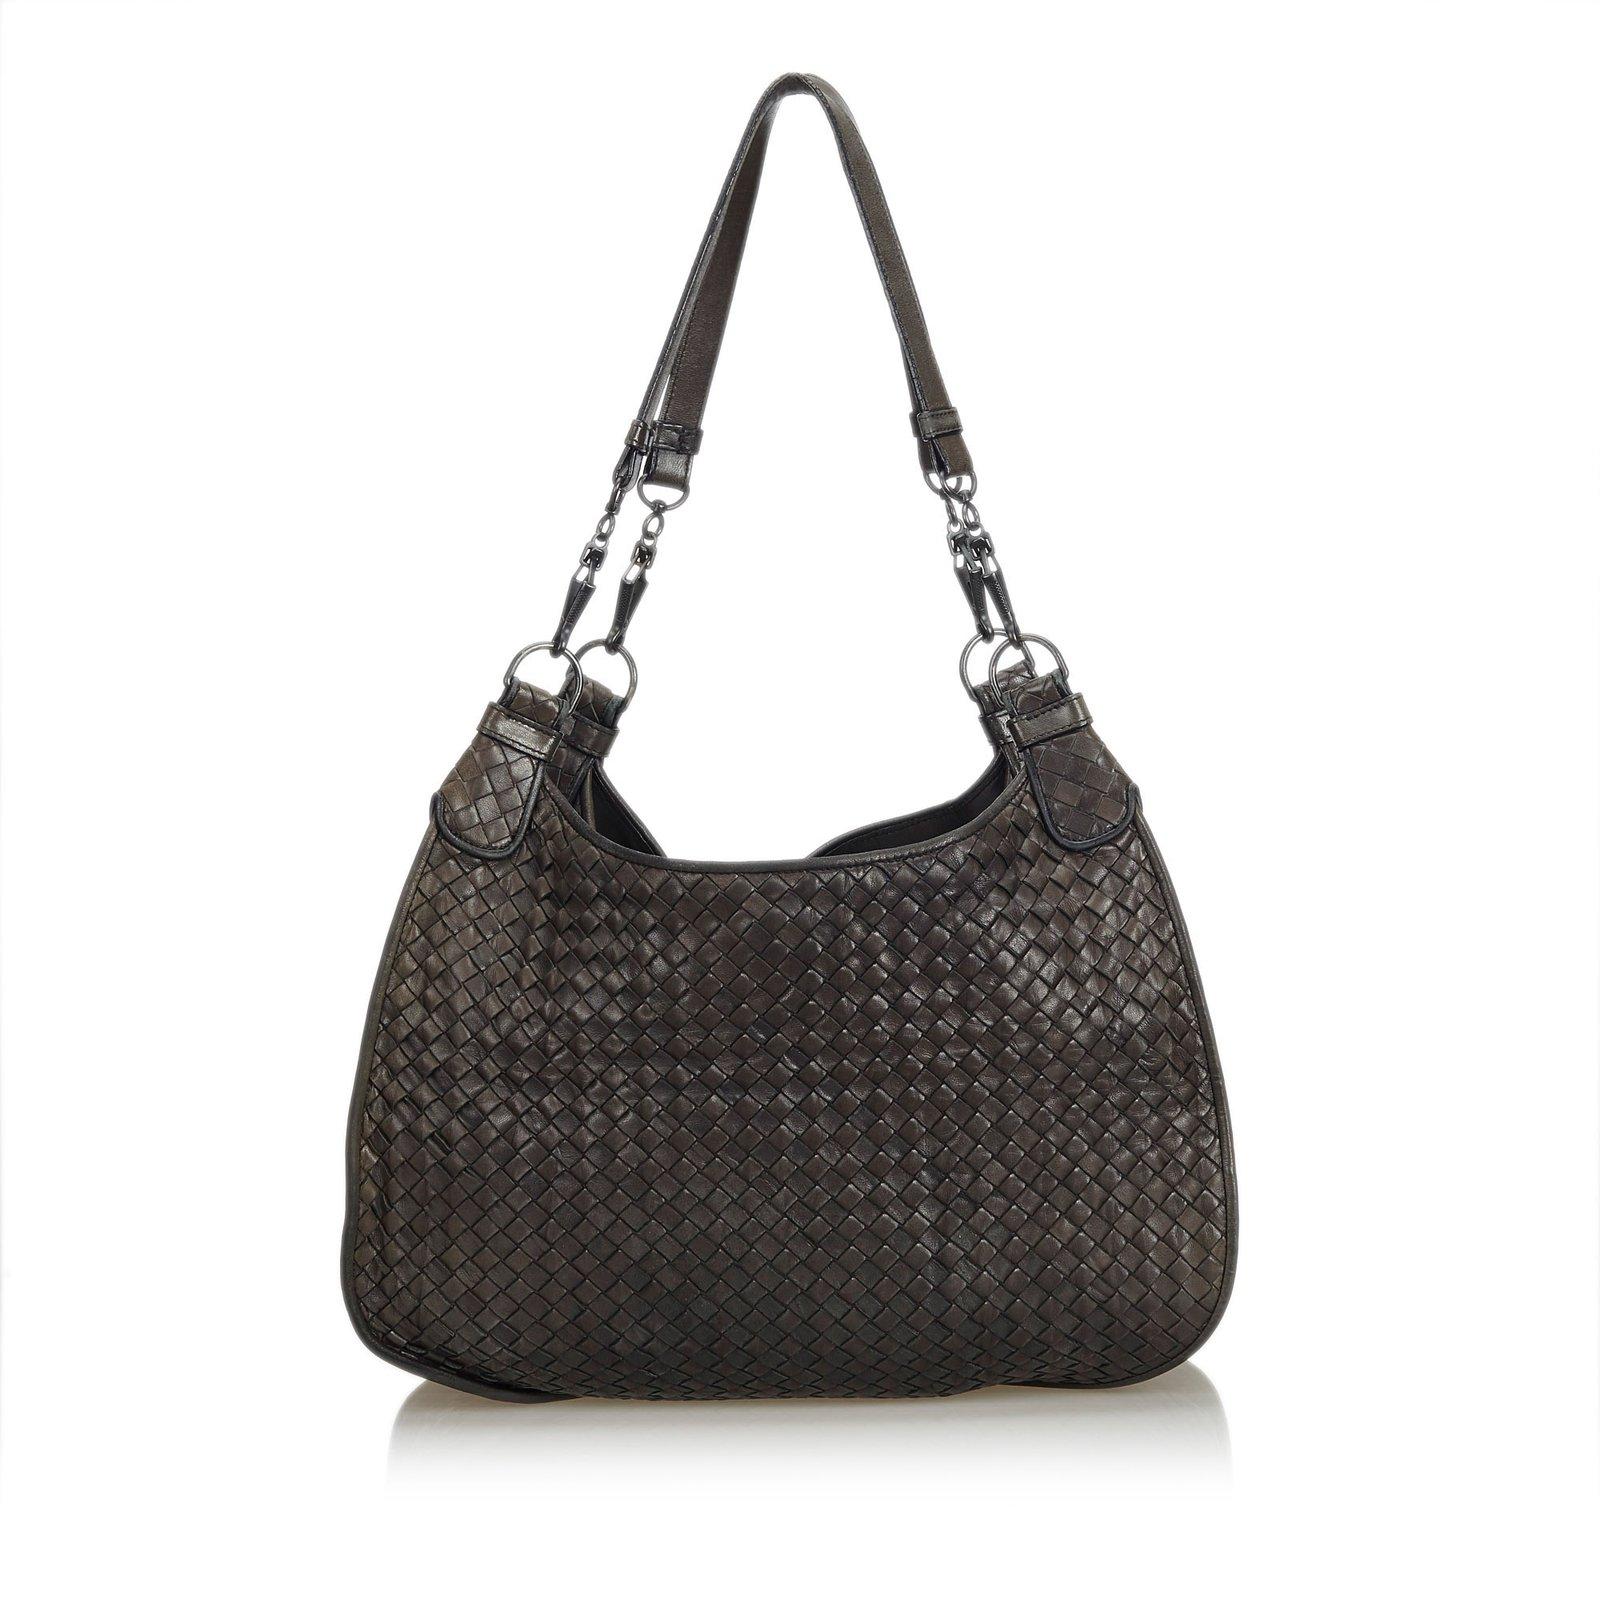 cb896628172f Bottega Veneta Intrecciato Leather Hobo Bag Handbags Leather